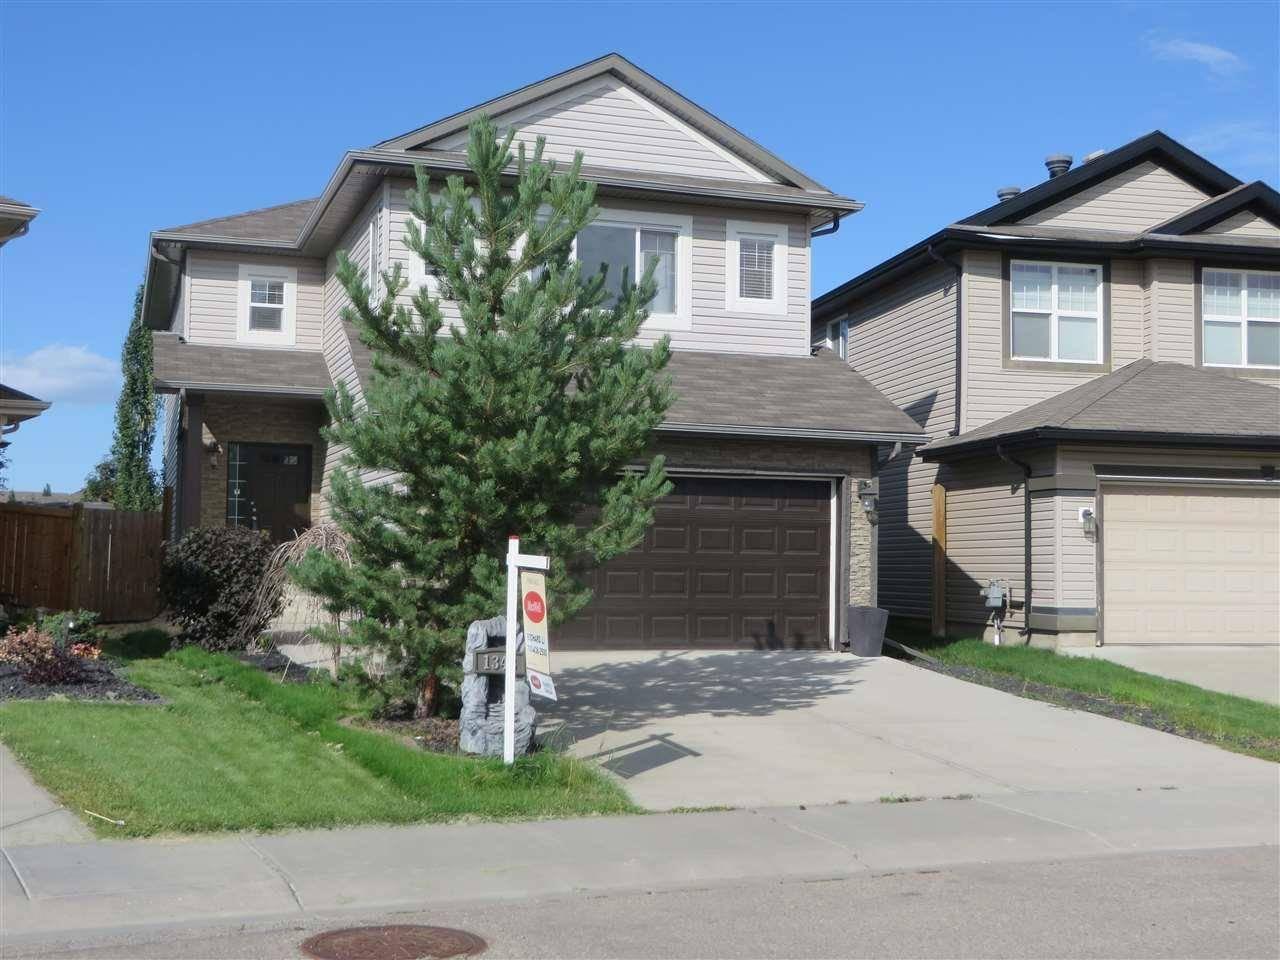 House for sale at 1343 117 St Sw Edmonton Alberta - MLS: E4170815